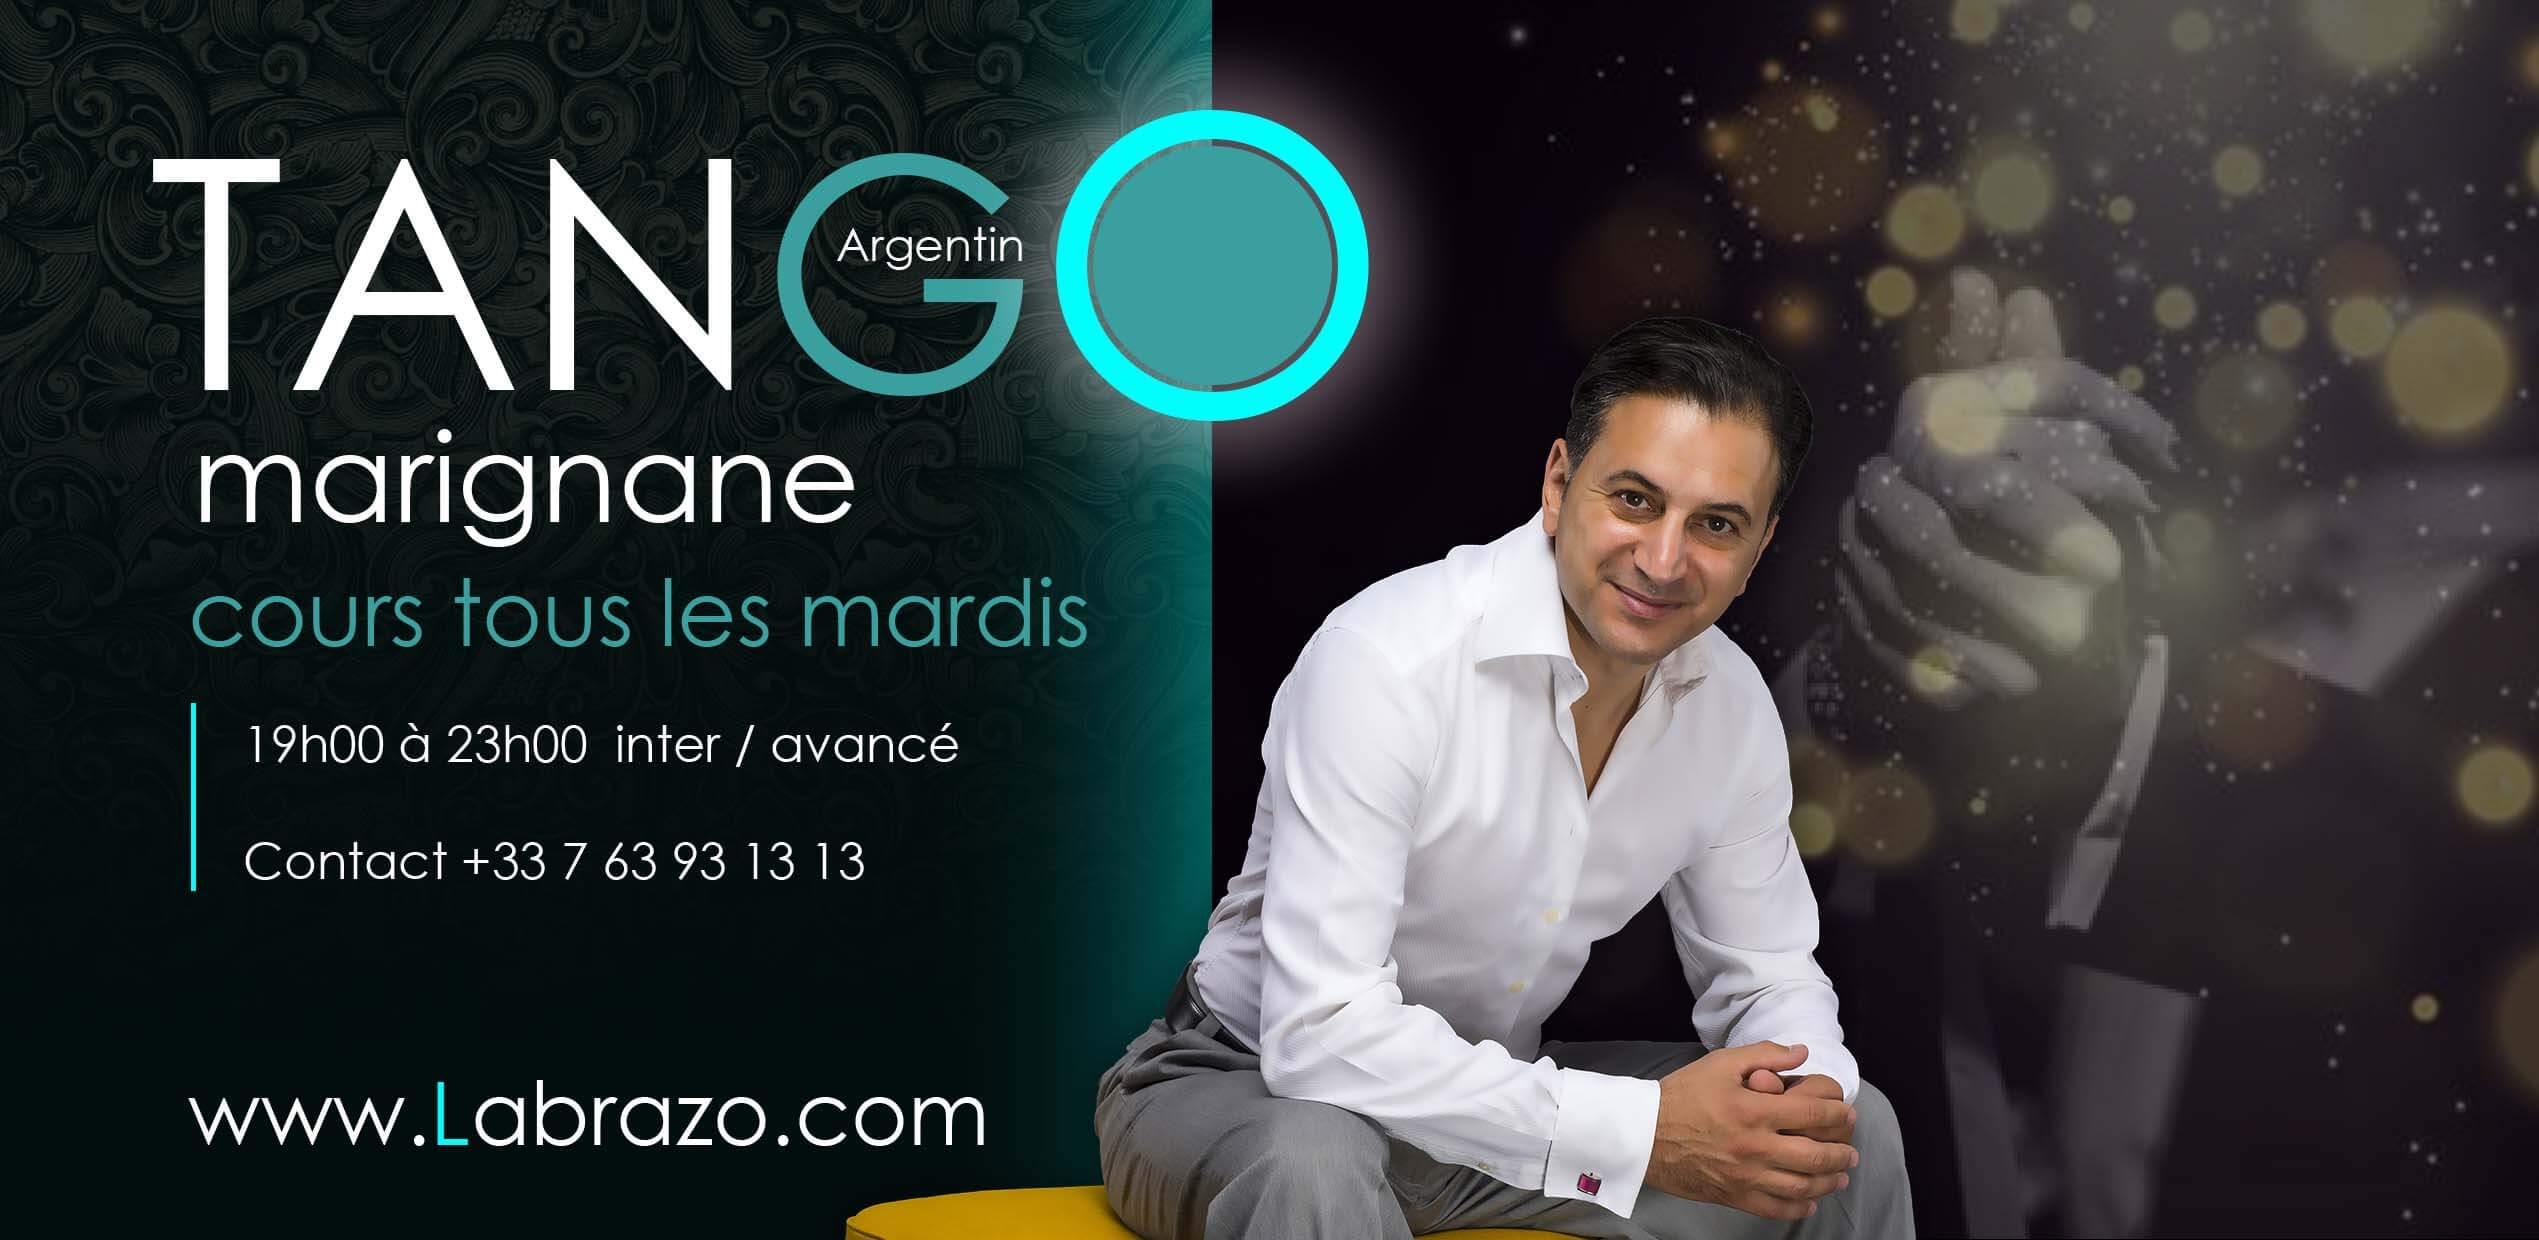 Tango Argentin à Marignane